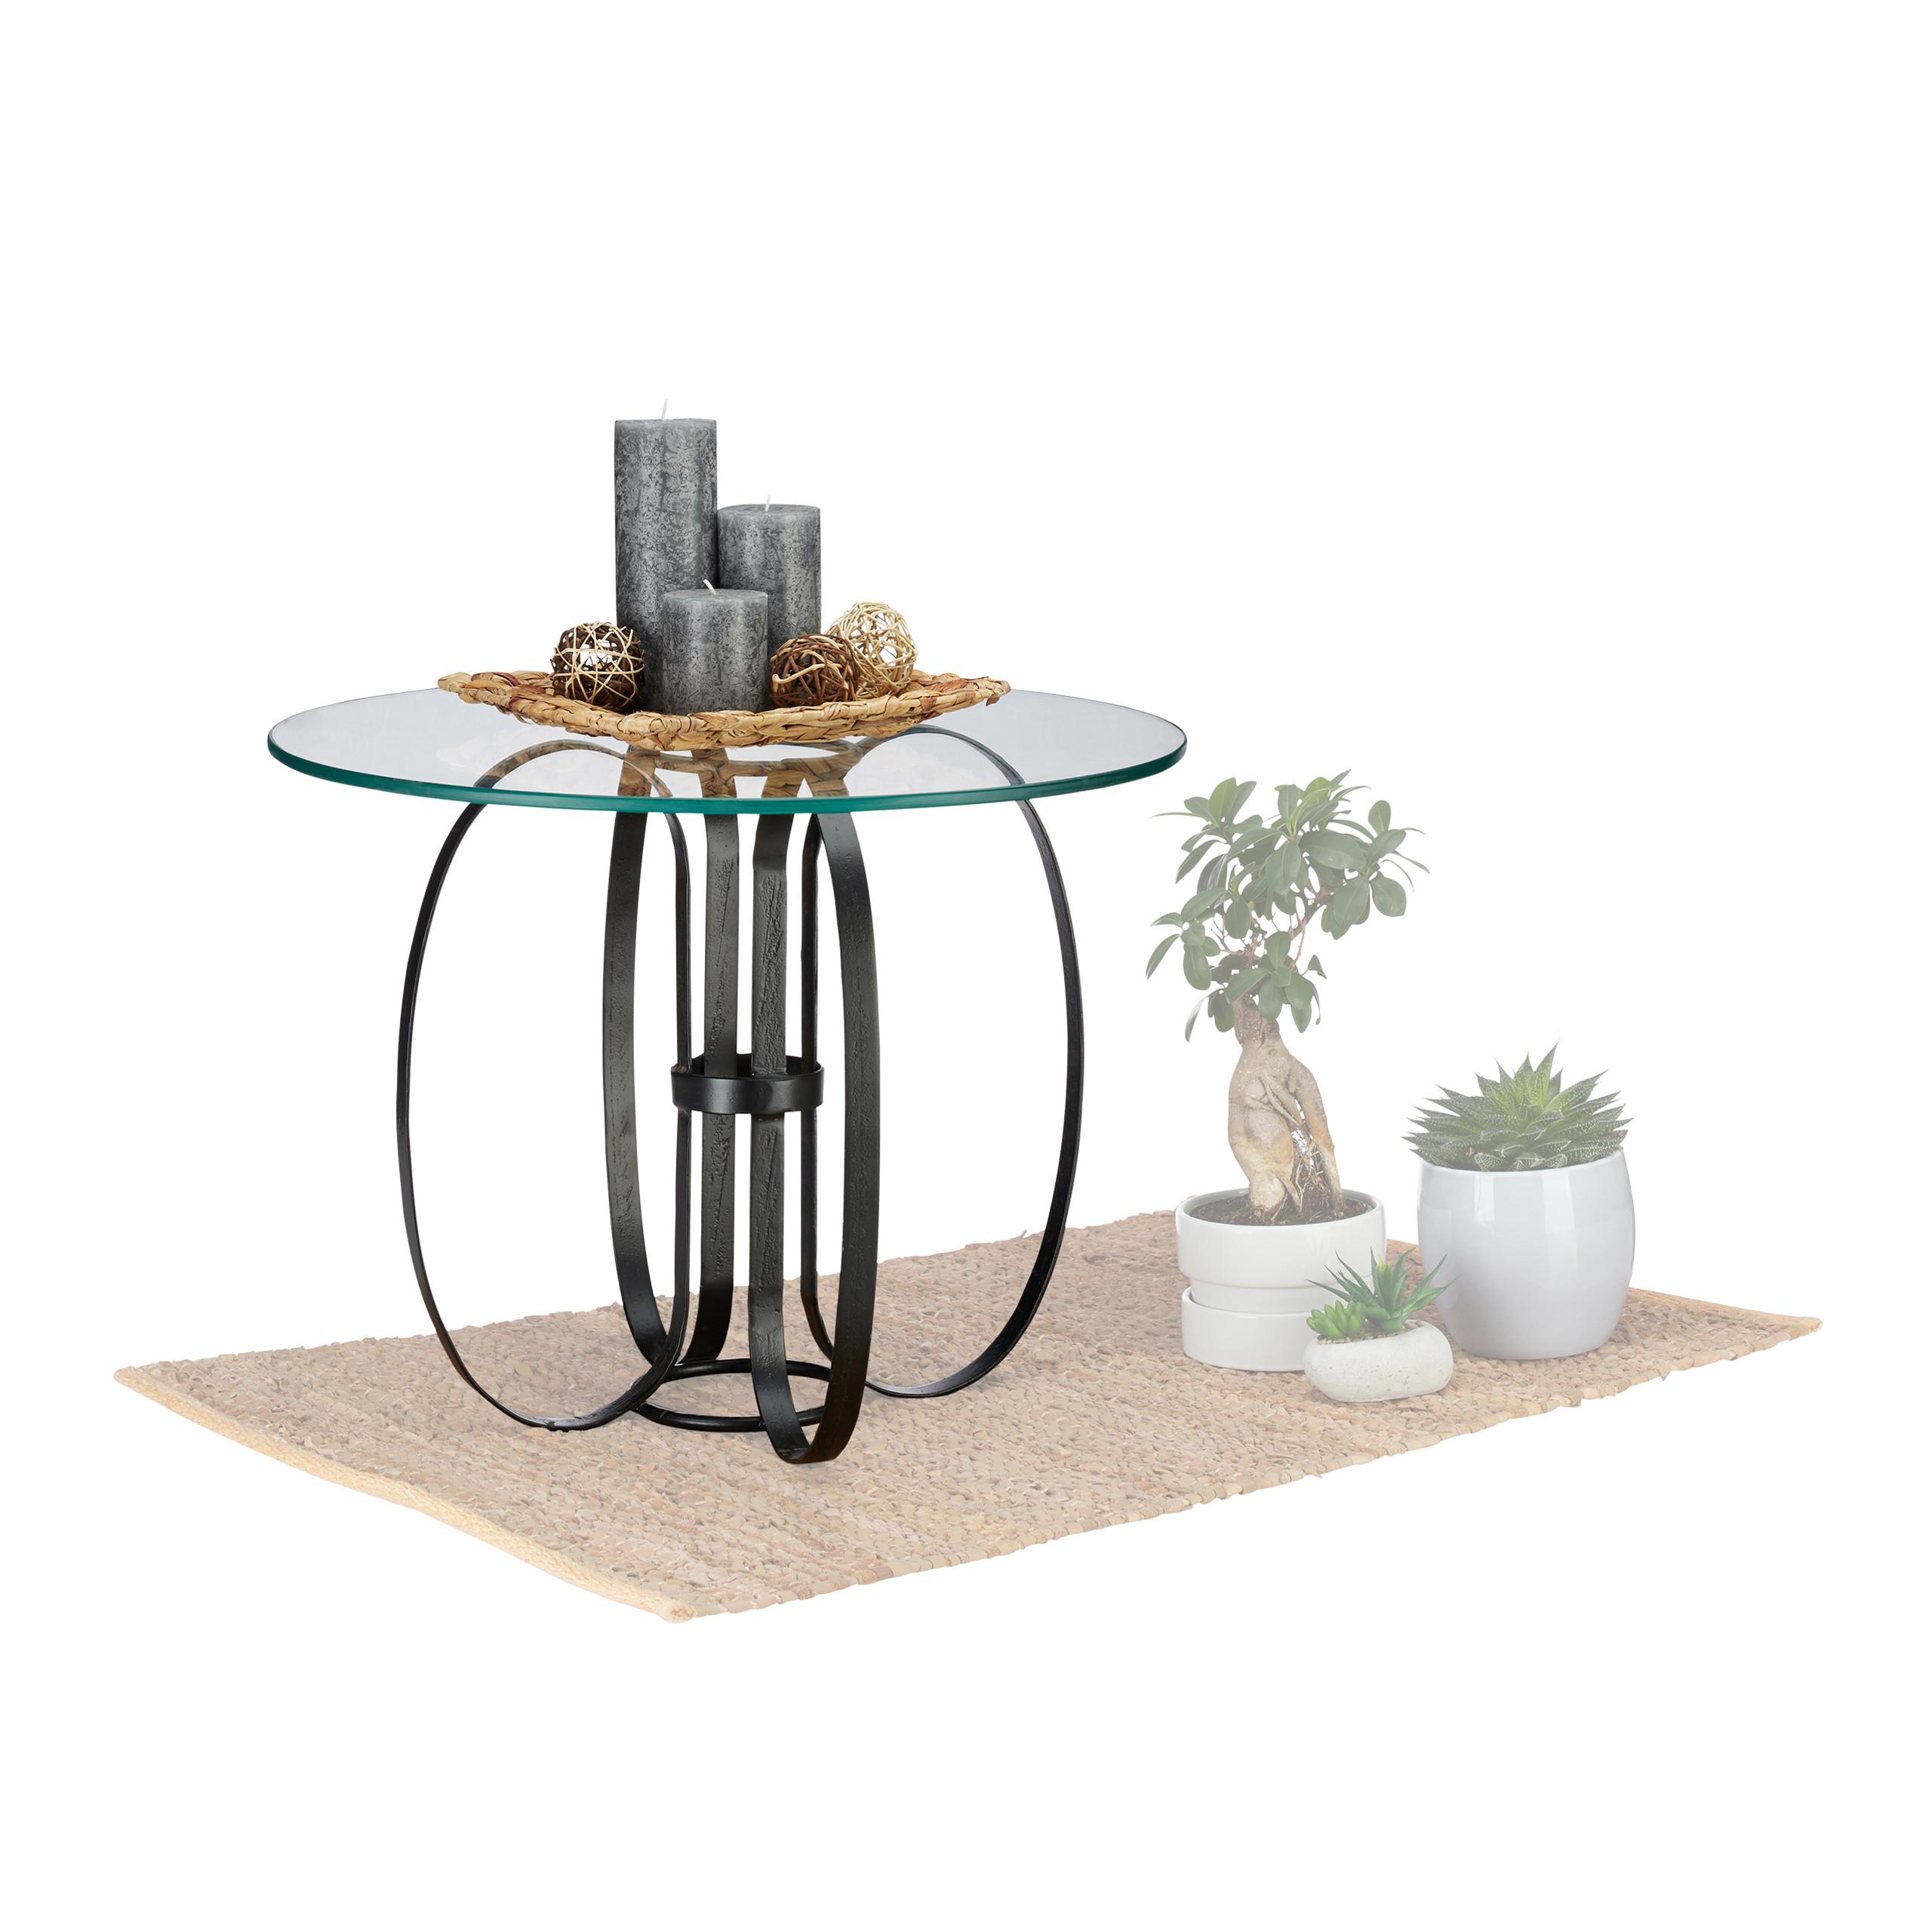 Details Sur Table D Appoint Ronde Verre Metal Table Salon Moderne Table Basse Design